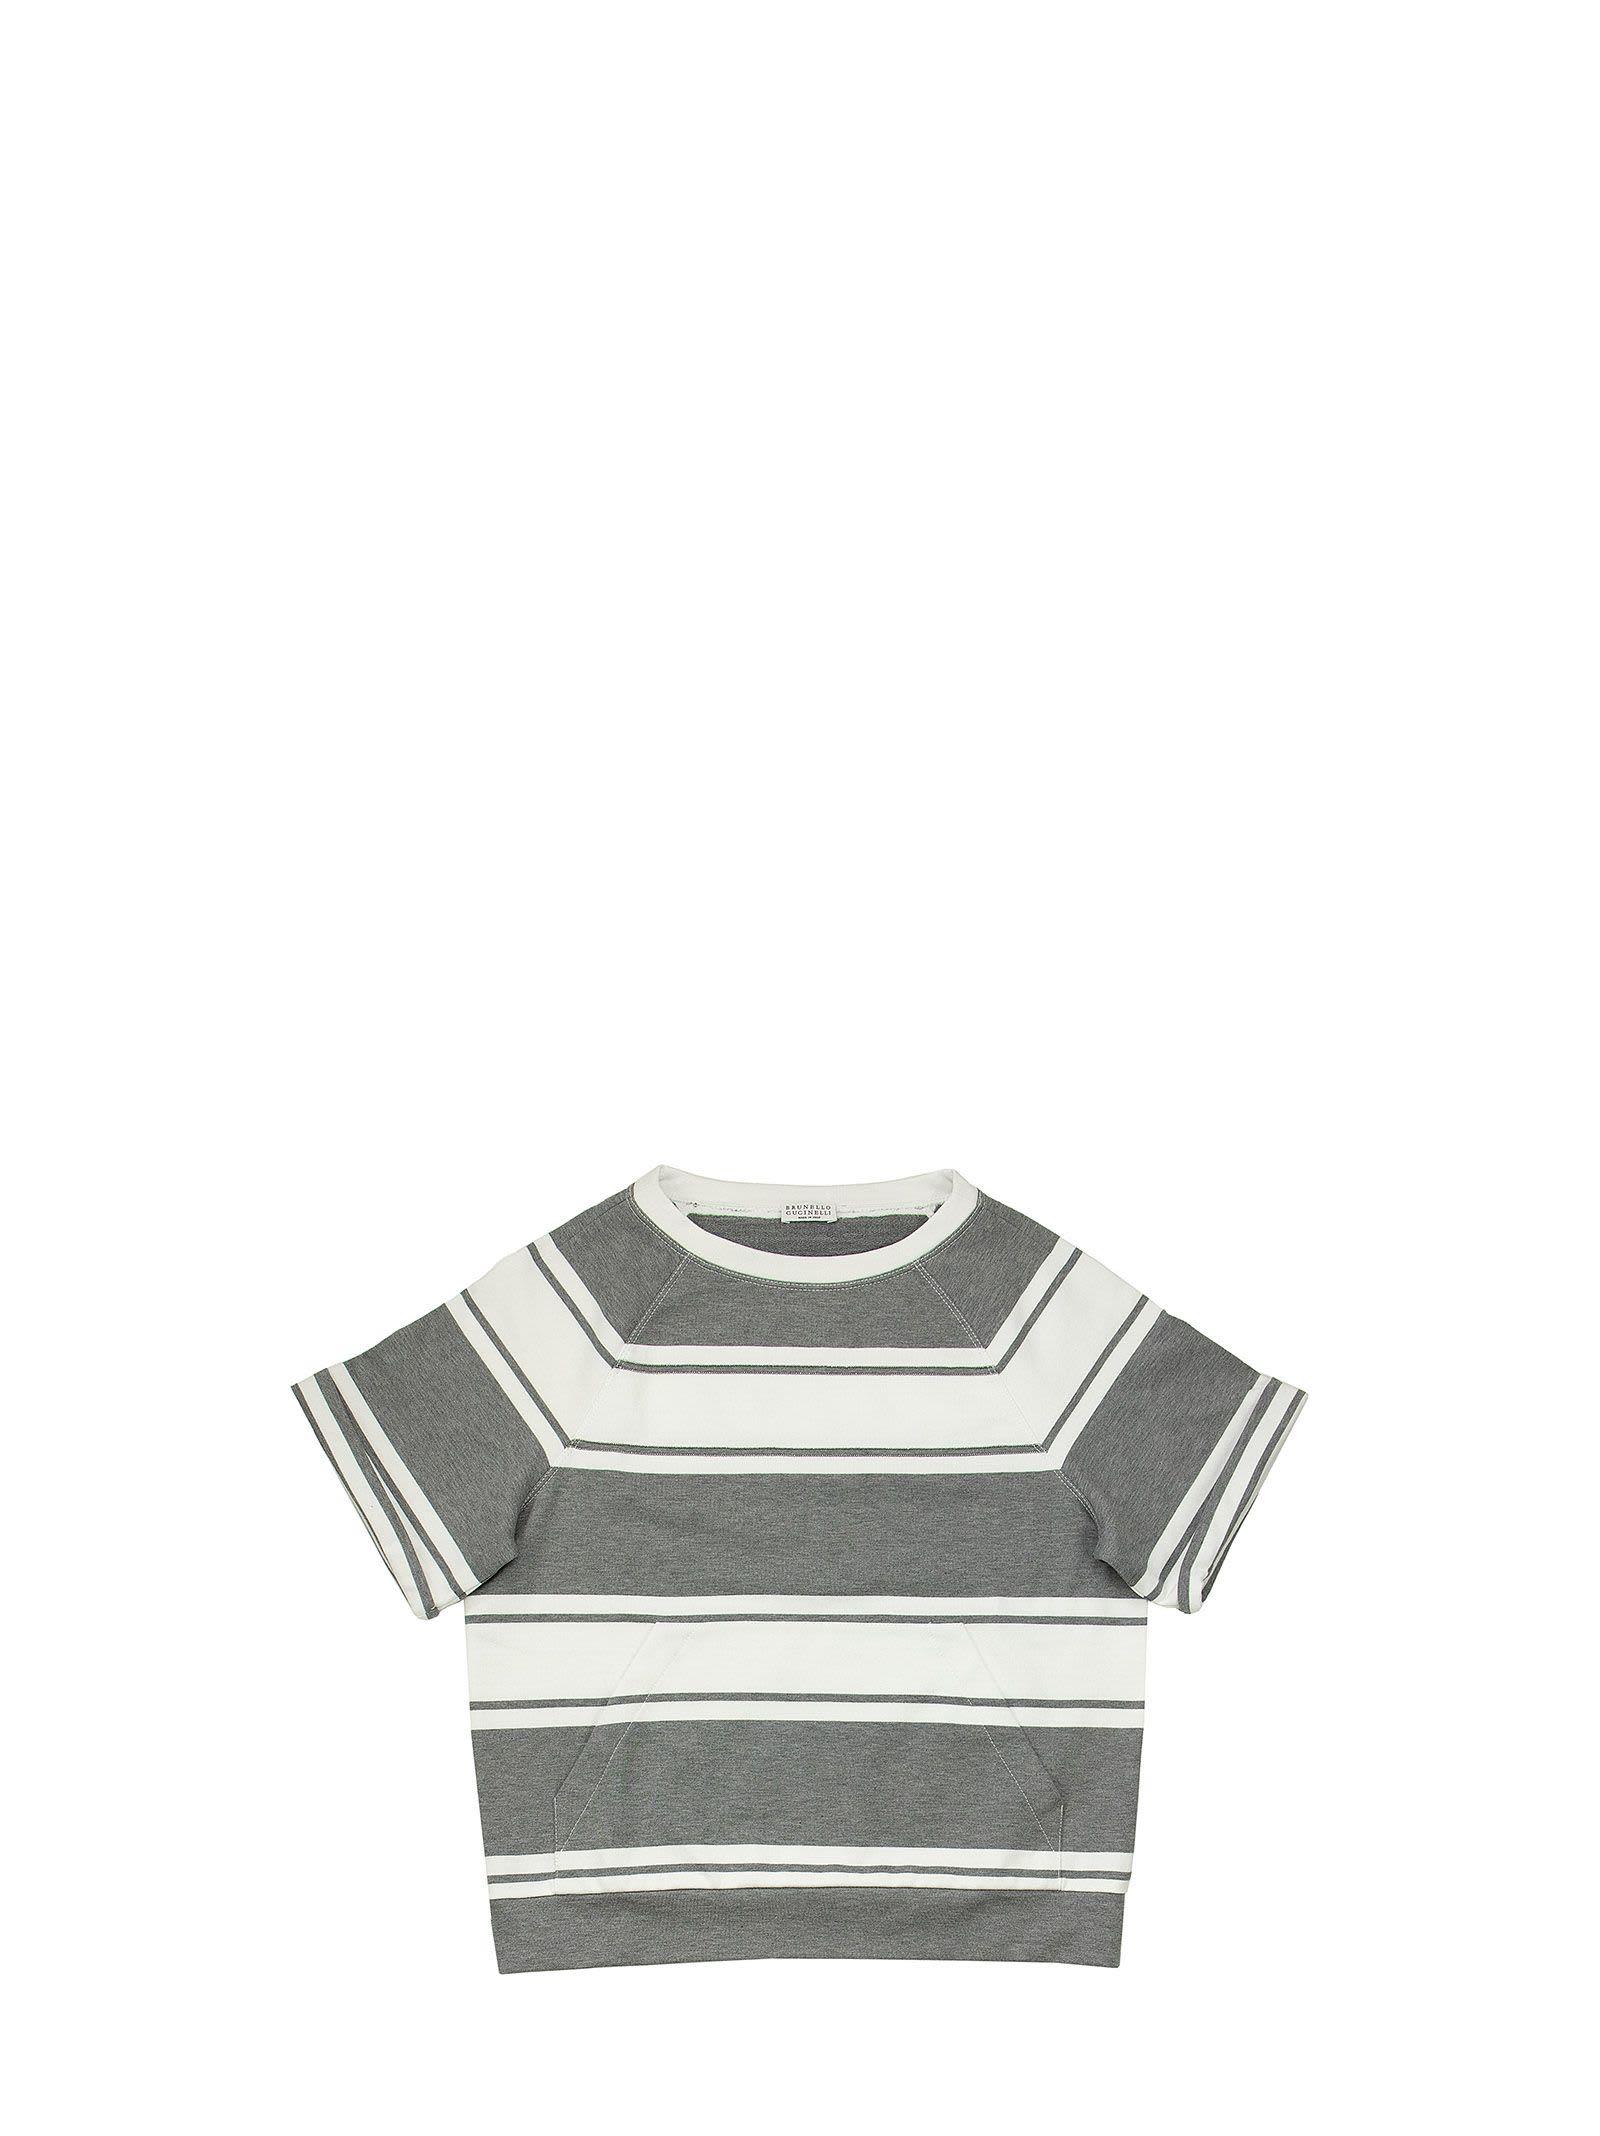 Brunello Cucinelli Cotton Striped French Terry Sweatshirt With Monili